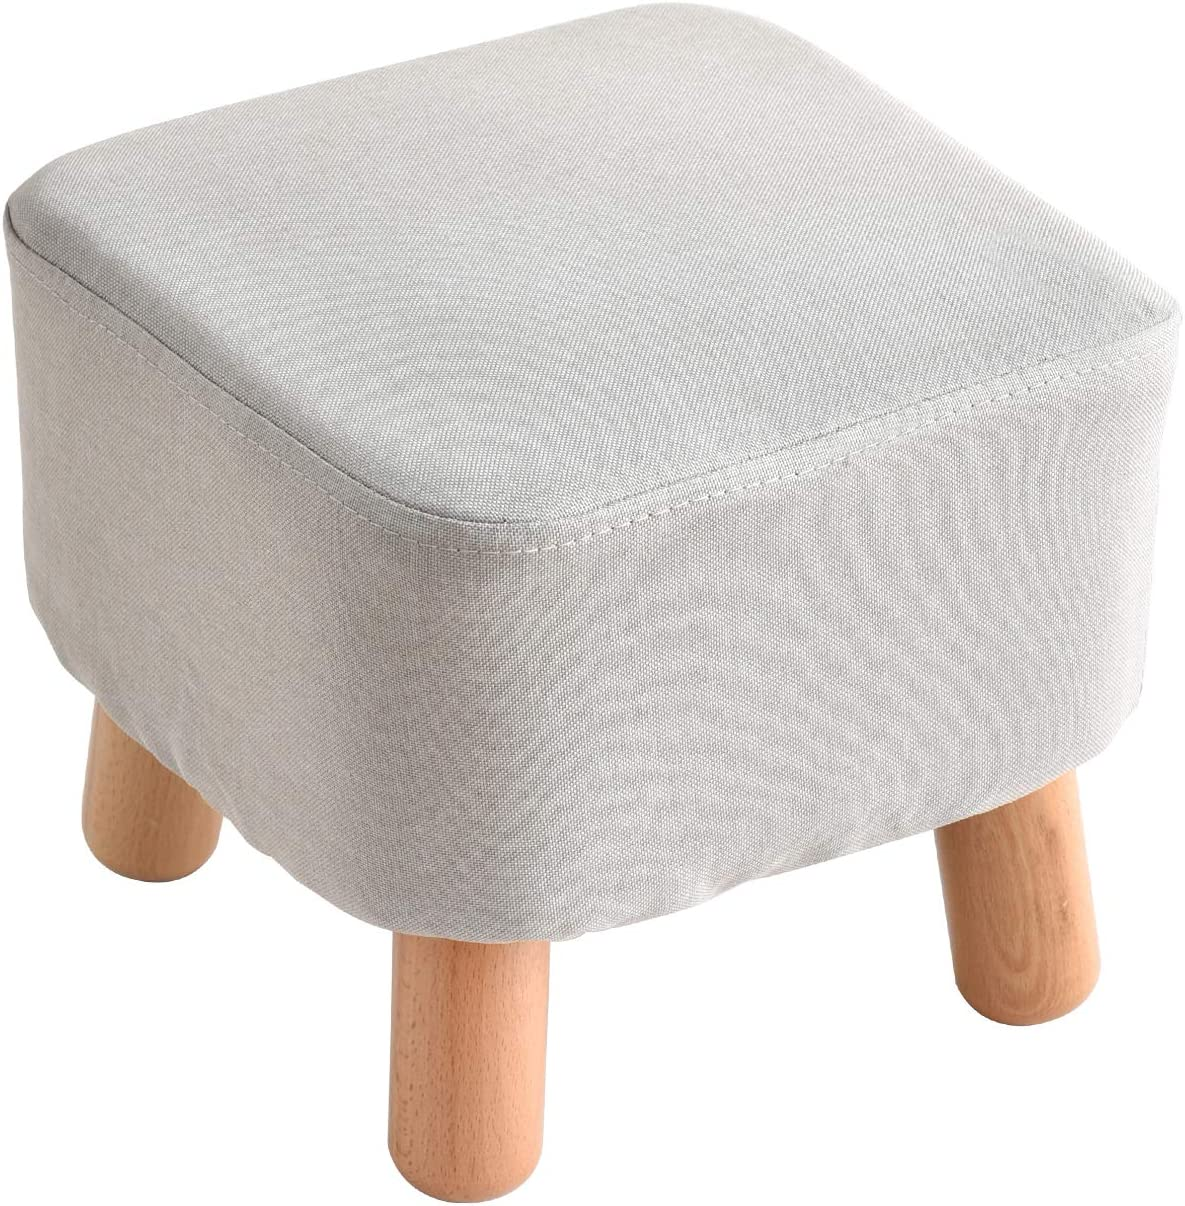 Bunnies Under desk 10 cm footstool with plastic feet  upholstered footstool  small foot stool  upholstered foot stool  handmade footstool